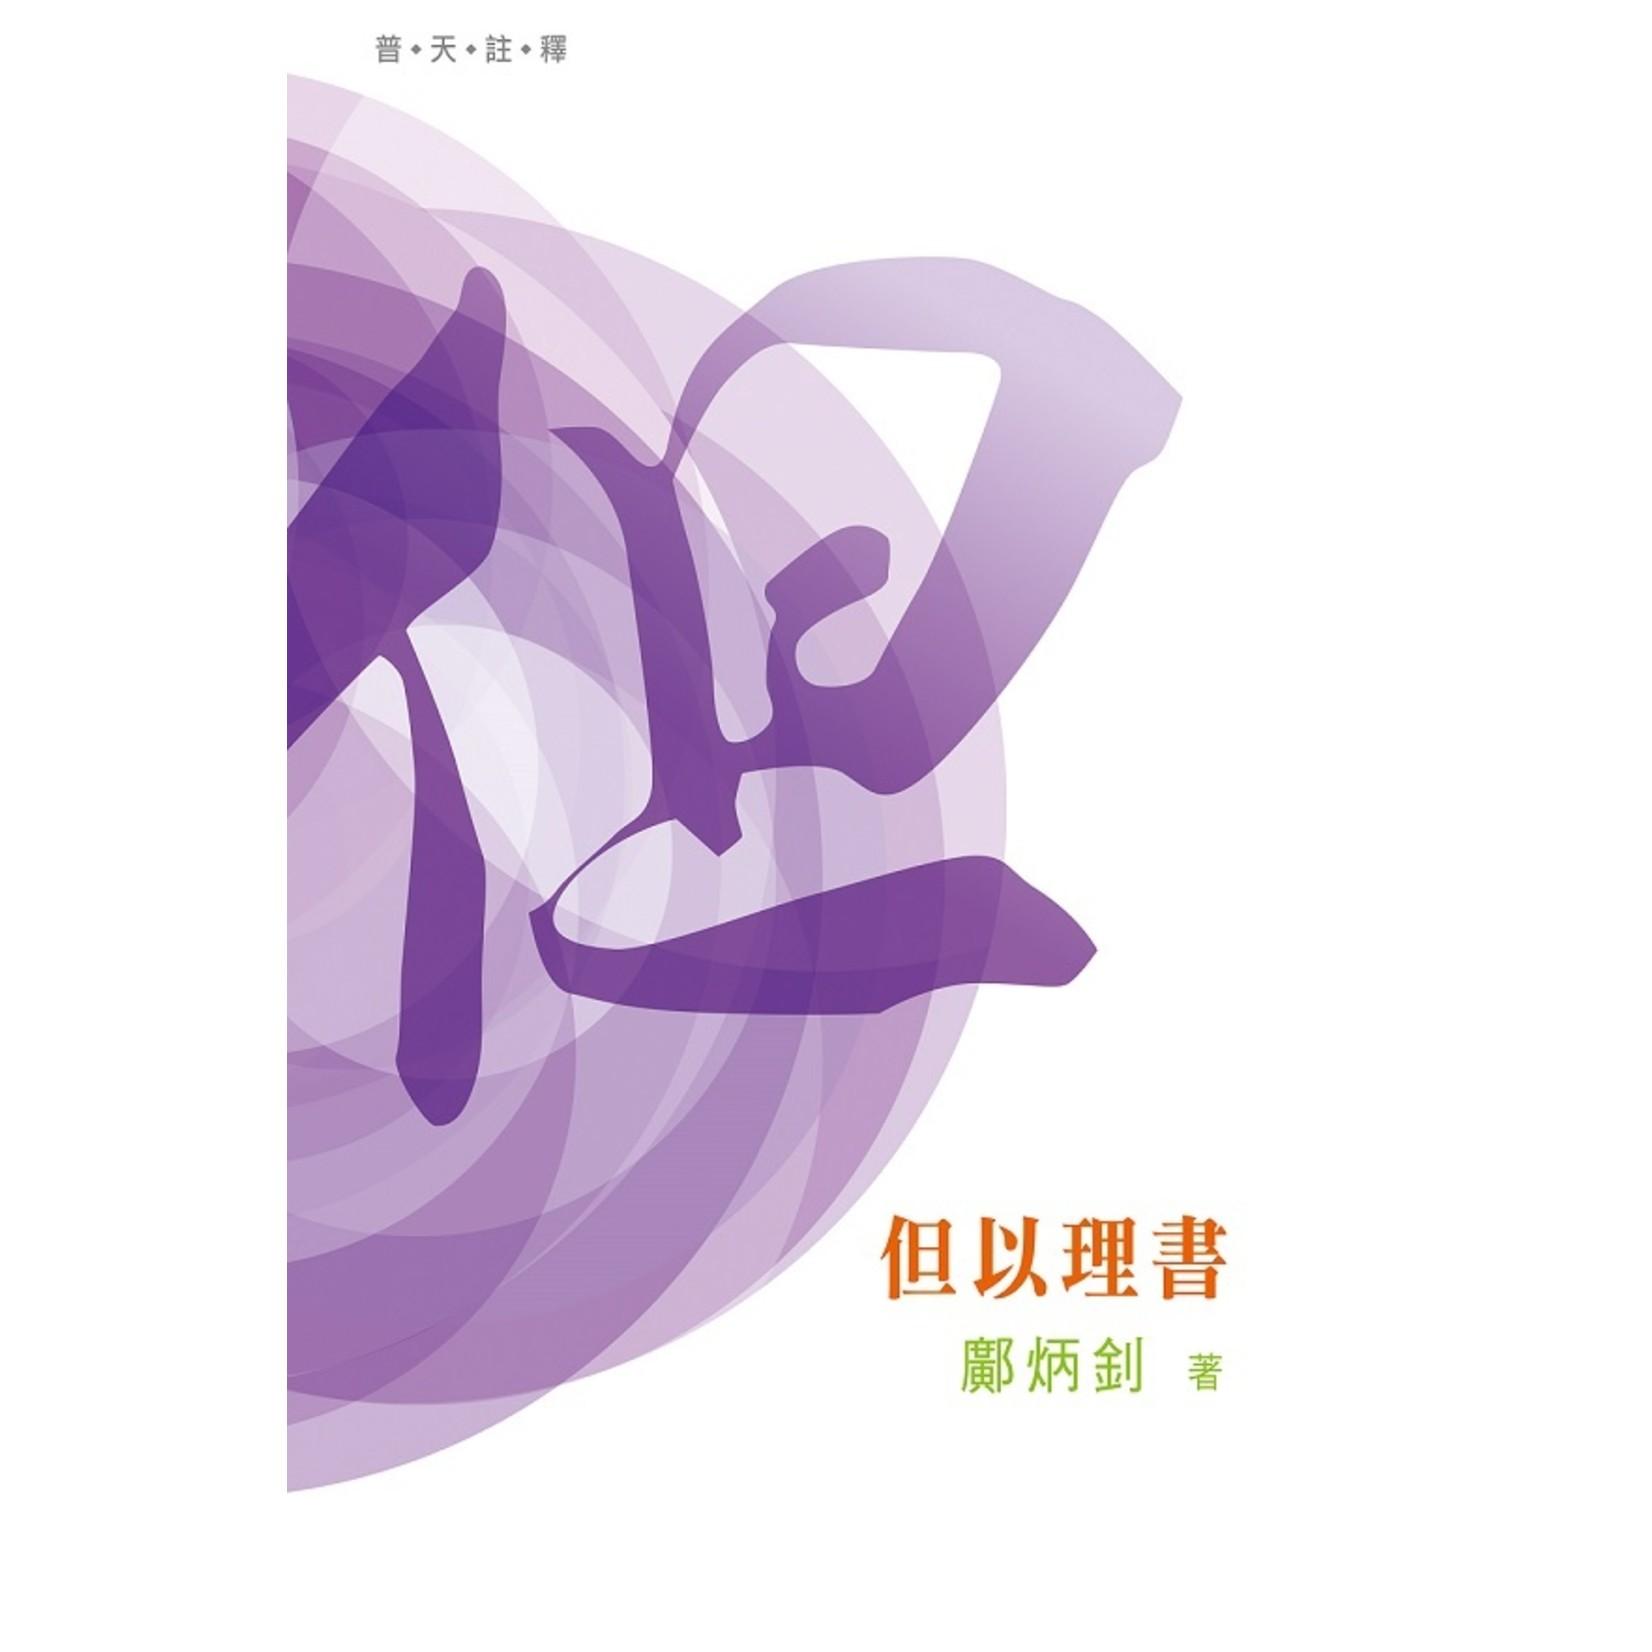 天道書樓 Tien Dao Publishing House 普天註釋:但以理書